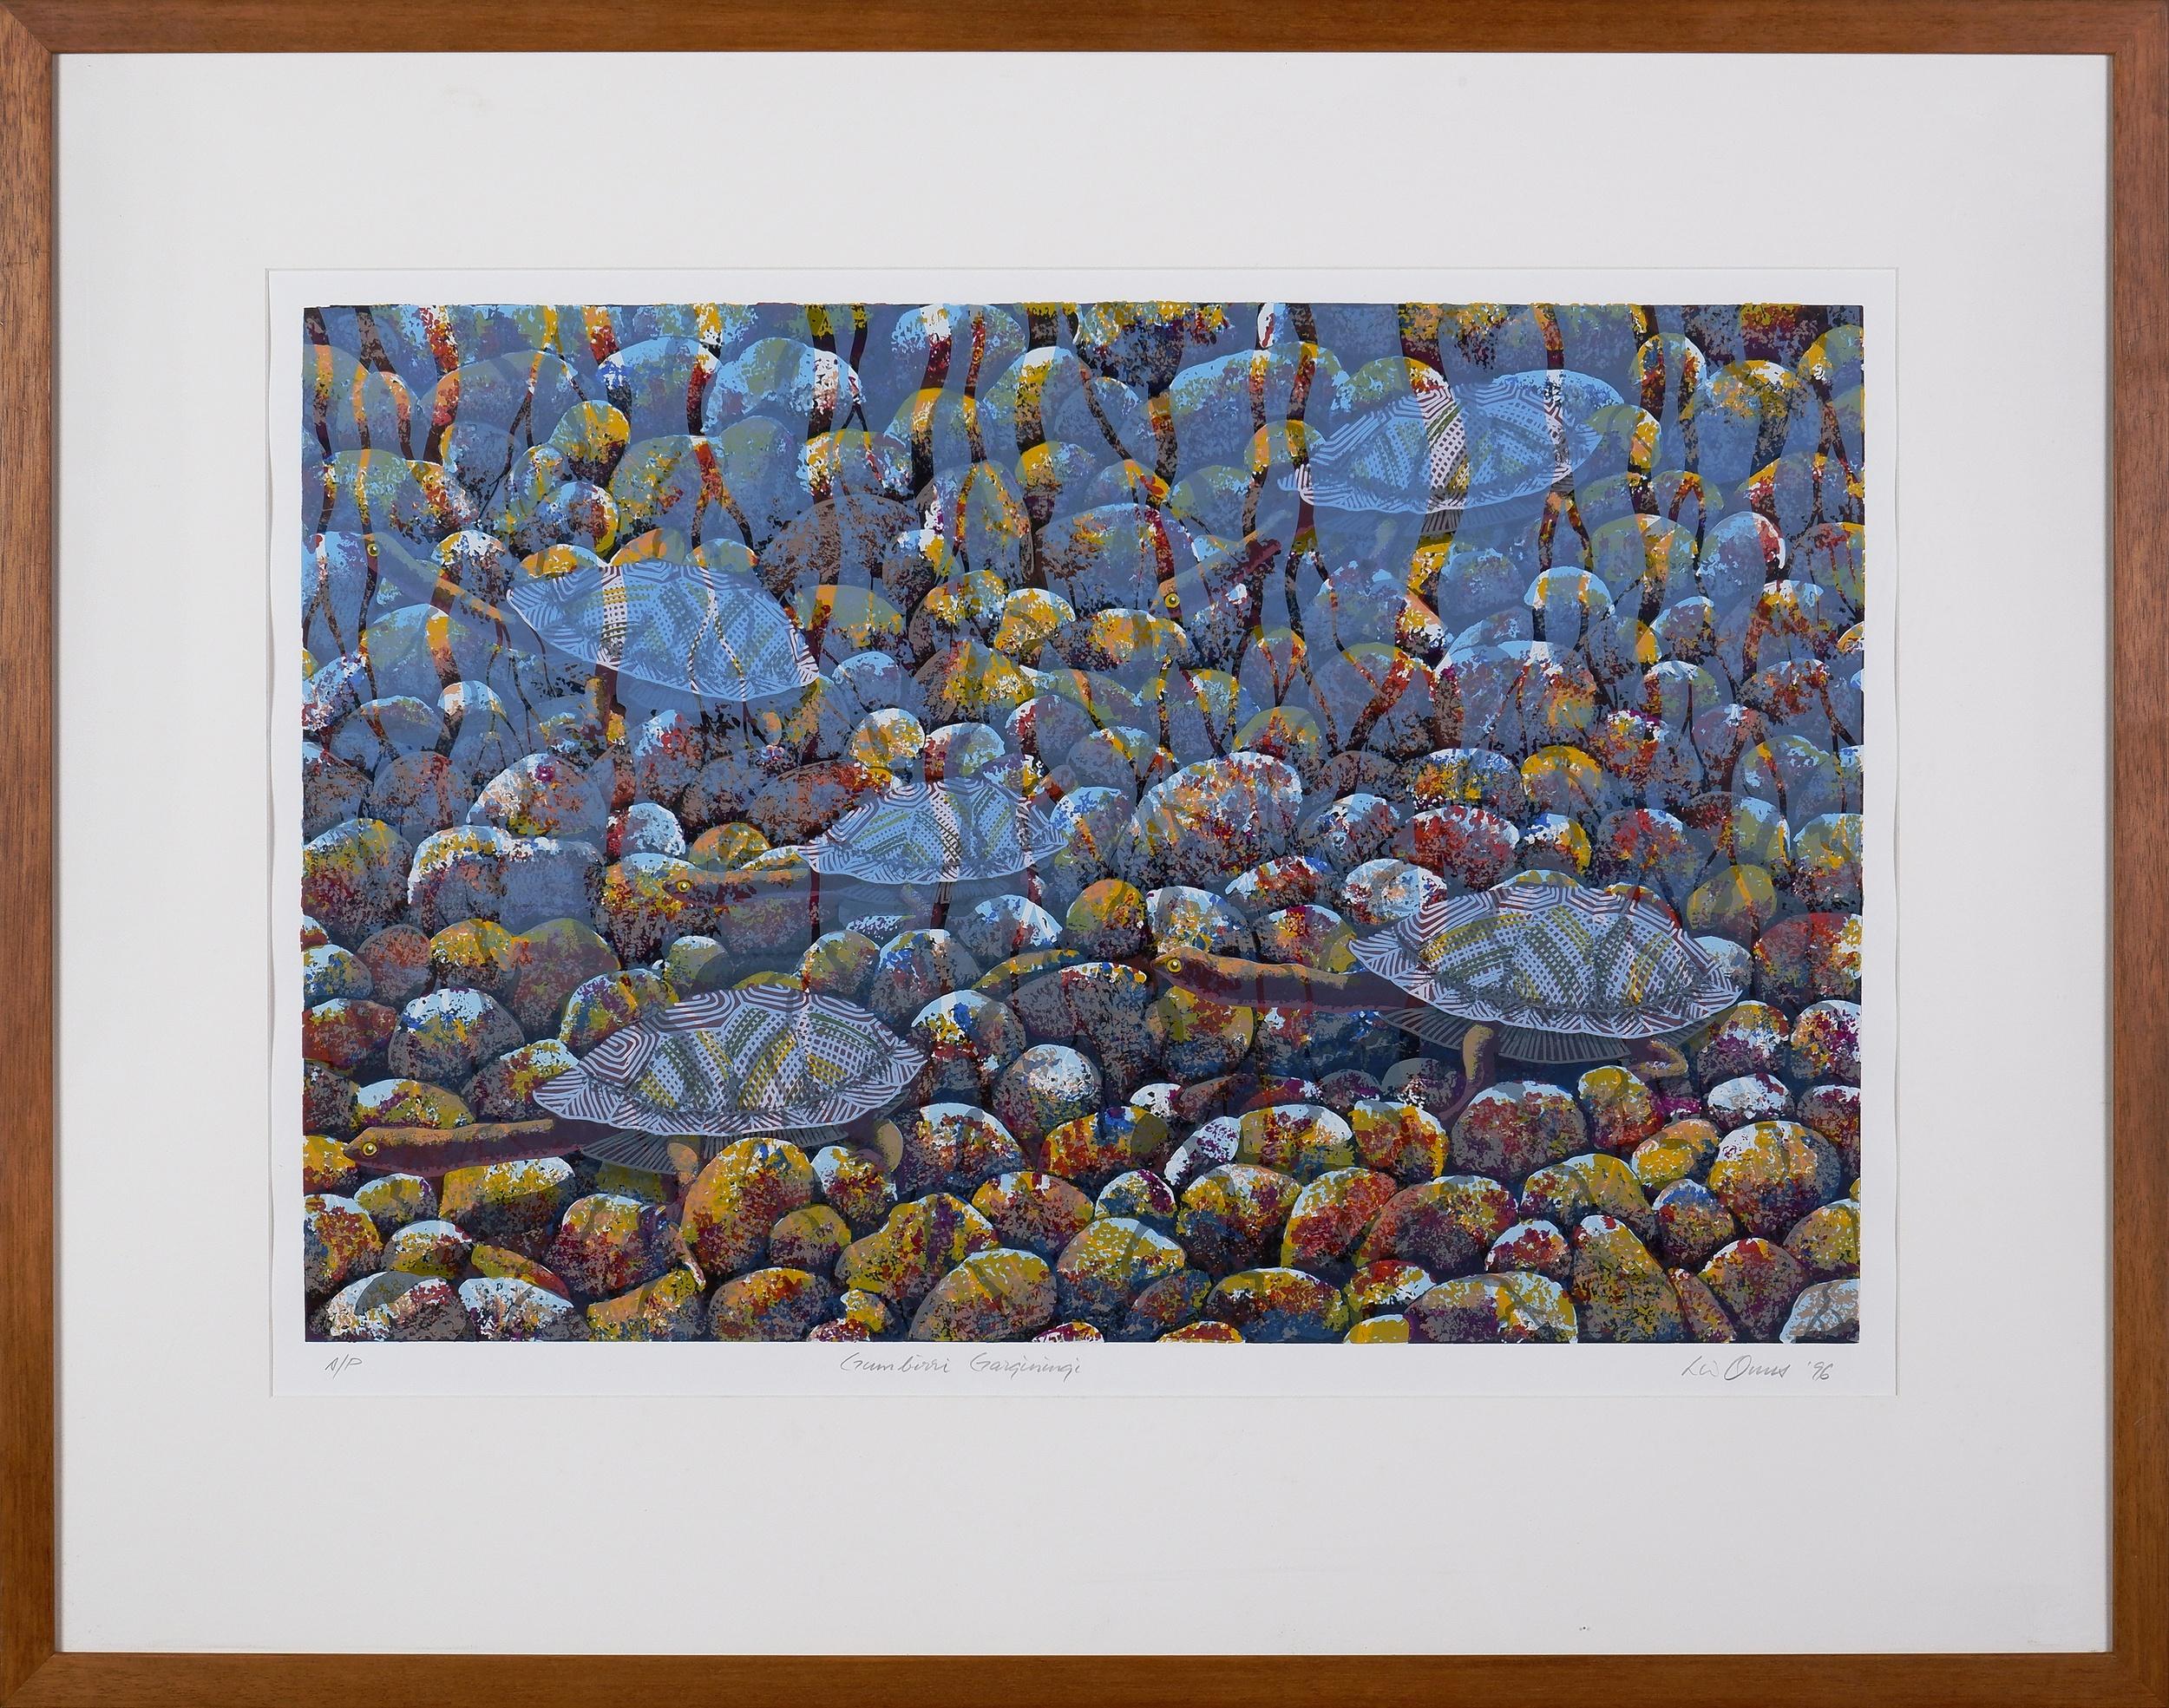 'Lin Onus (1948-1996 Yorta Yorta language group), Gumbirri Garganingi 1996, Screenprint A/P, 50 x 70 cm (image size)'